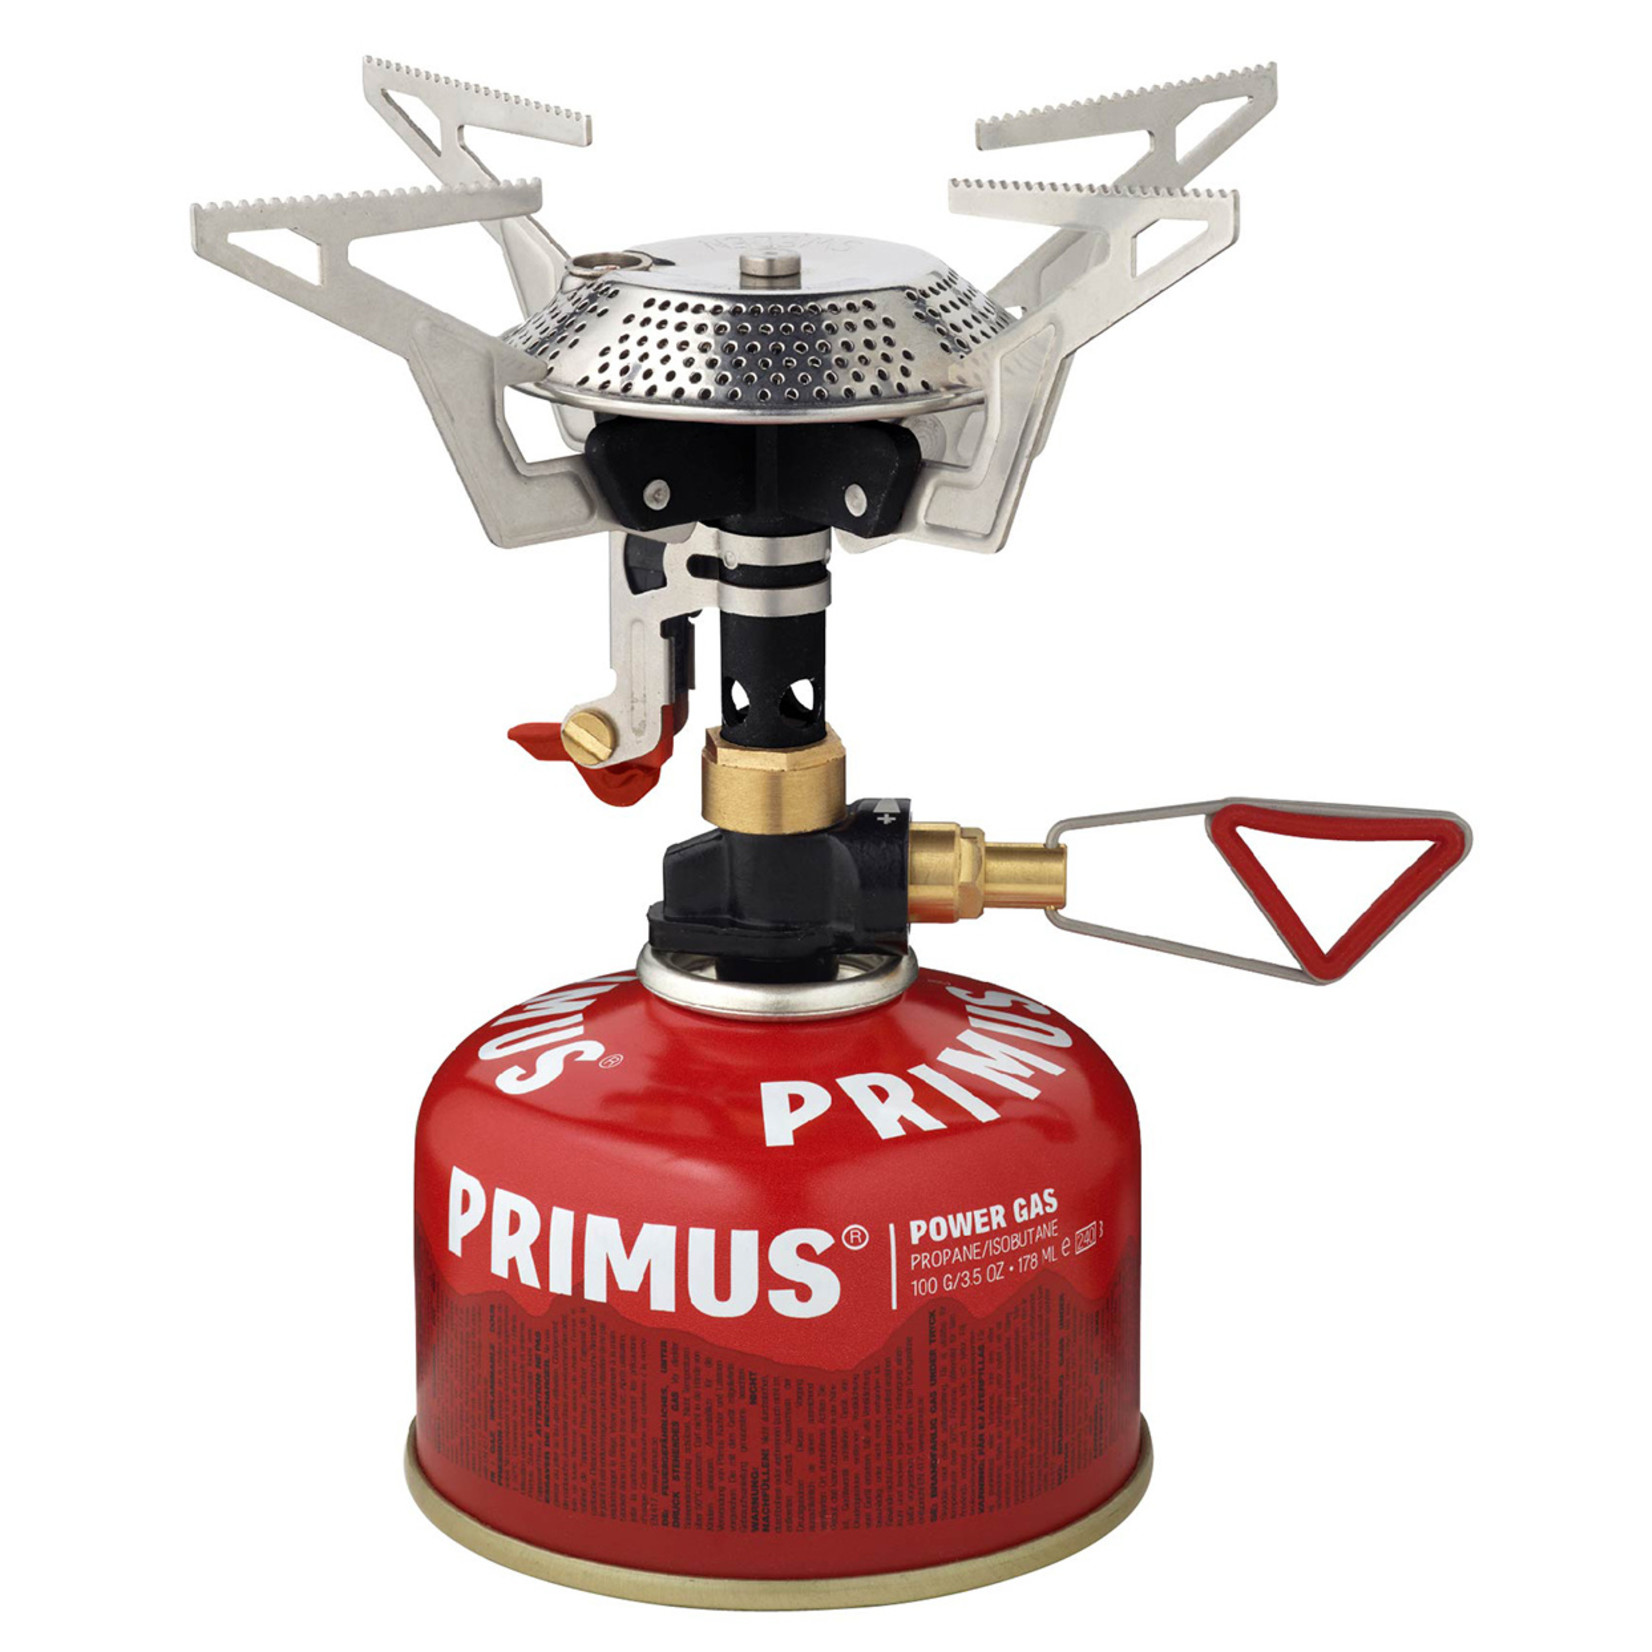 Primus Primus PowerTrail stove piezo, compact